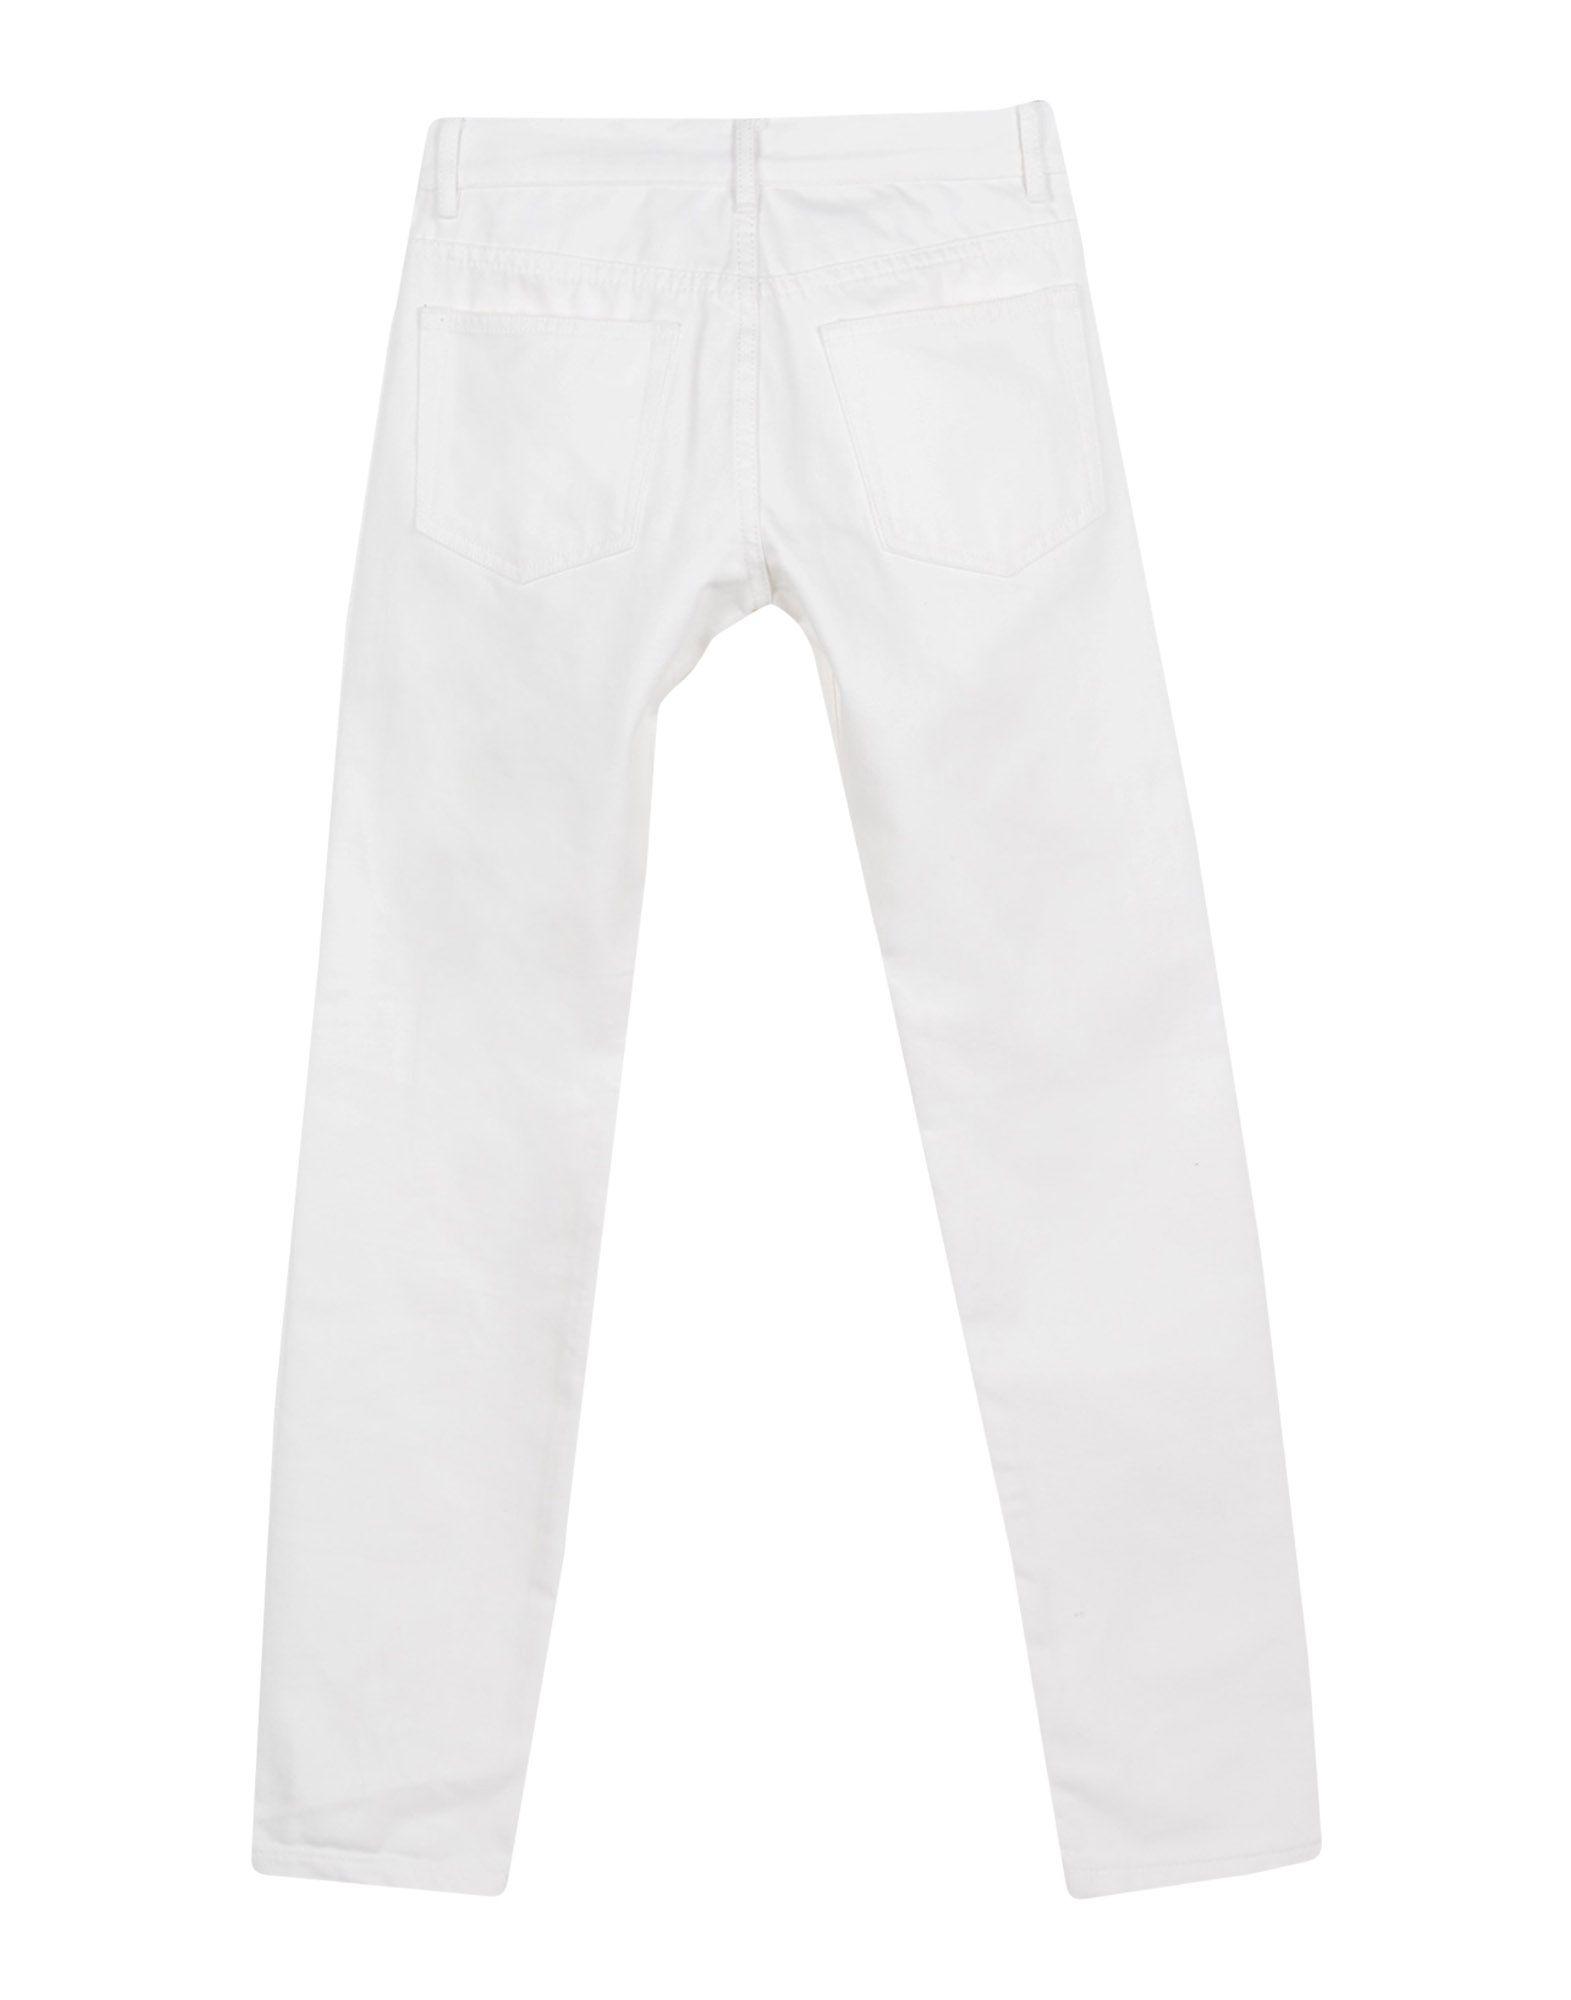 Pantaloni Jeans Enlist Enlist Enlist Uomo - 42653965BQ c72bc7